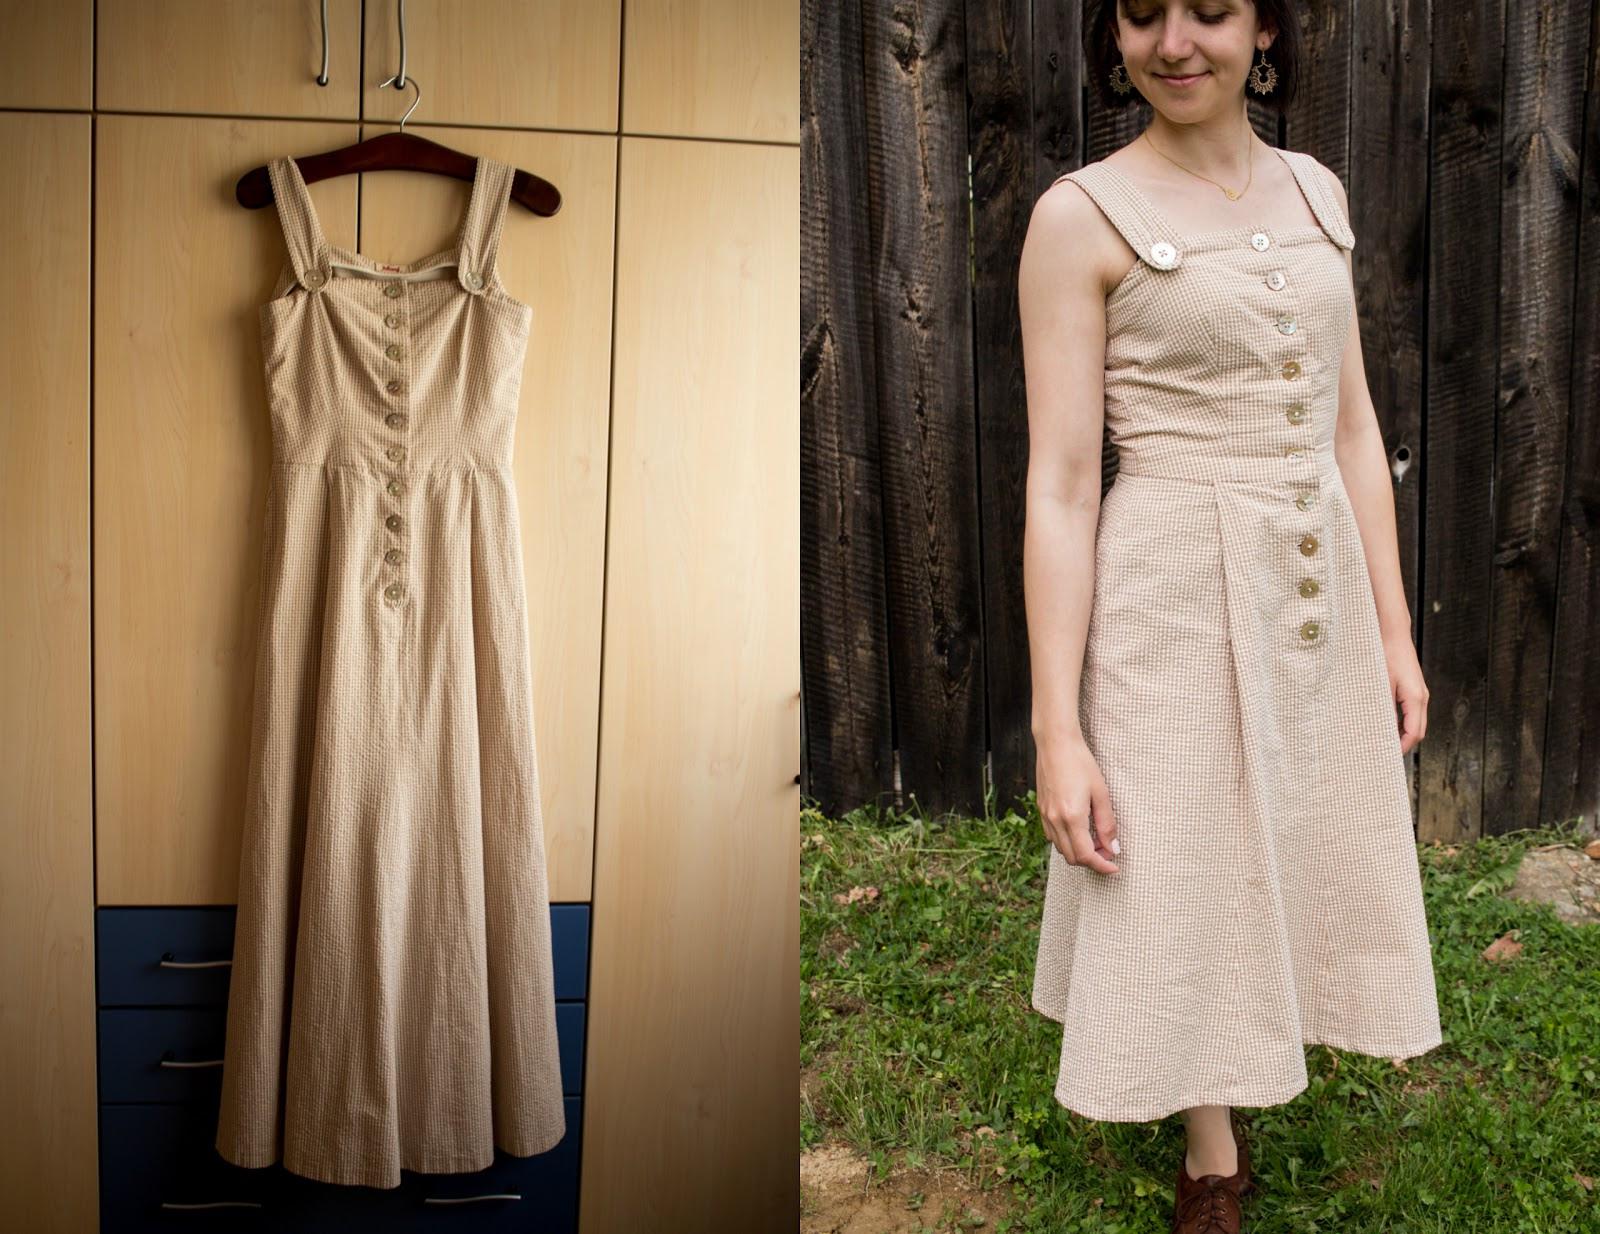 Kreativ Abendkleid Kürzen Spezialgebiet15 Fantastisch Abendkleid Kürzen Vertrieb